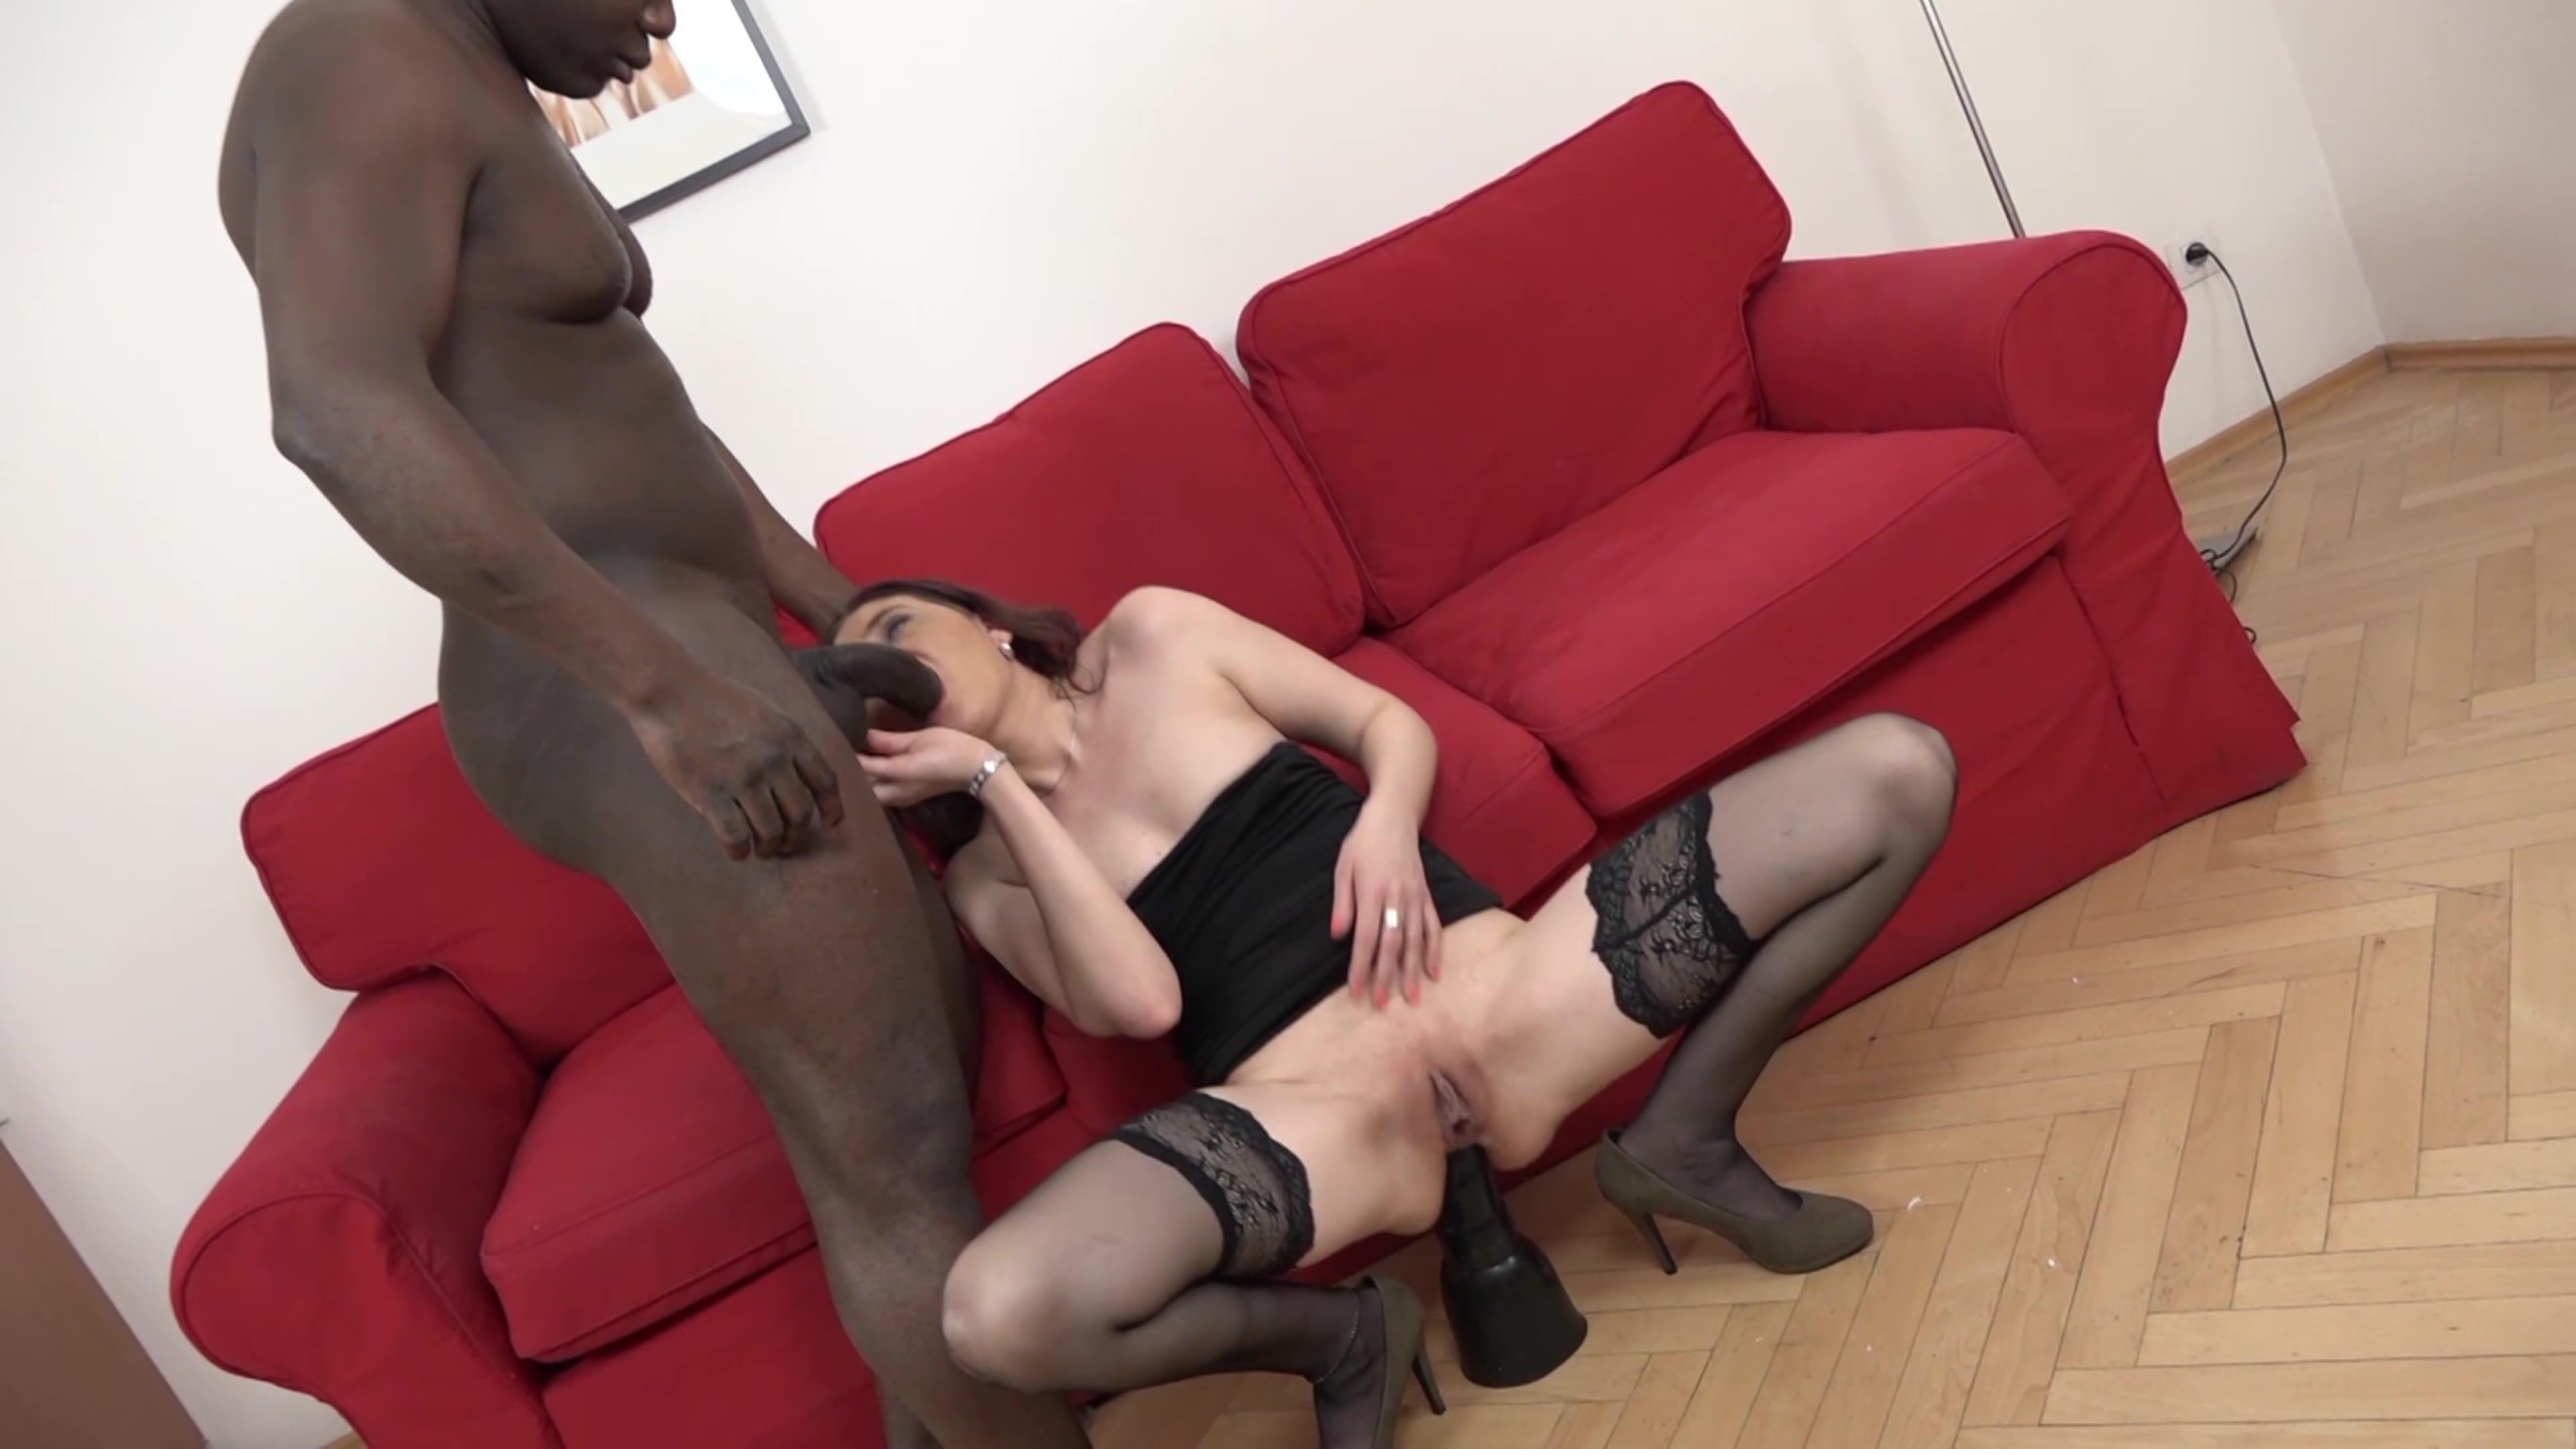 Milf takes big cock in her anus